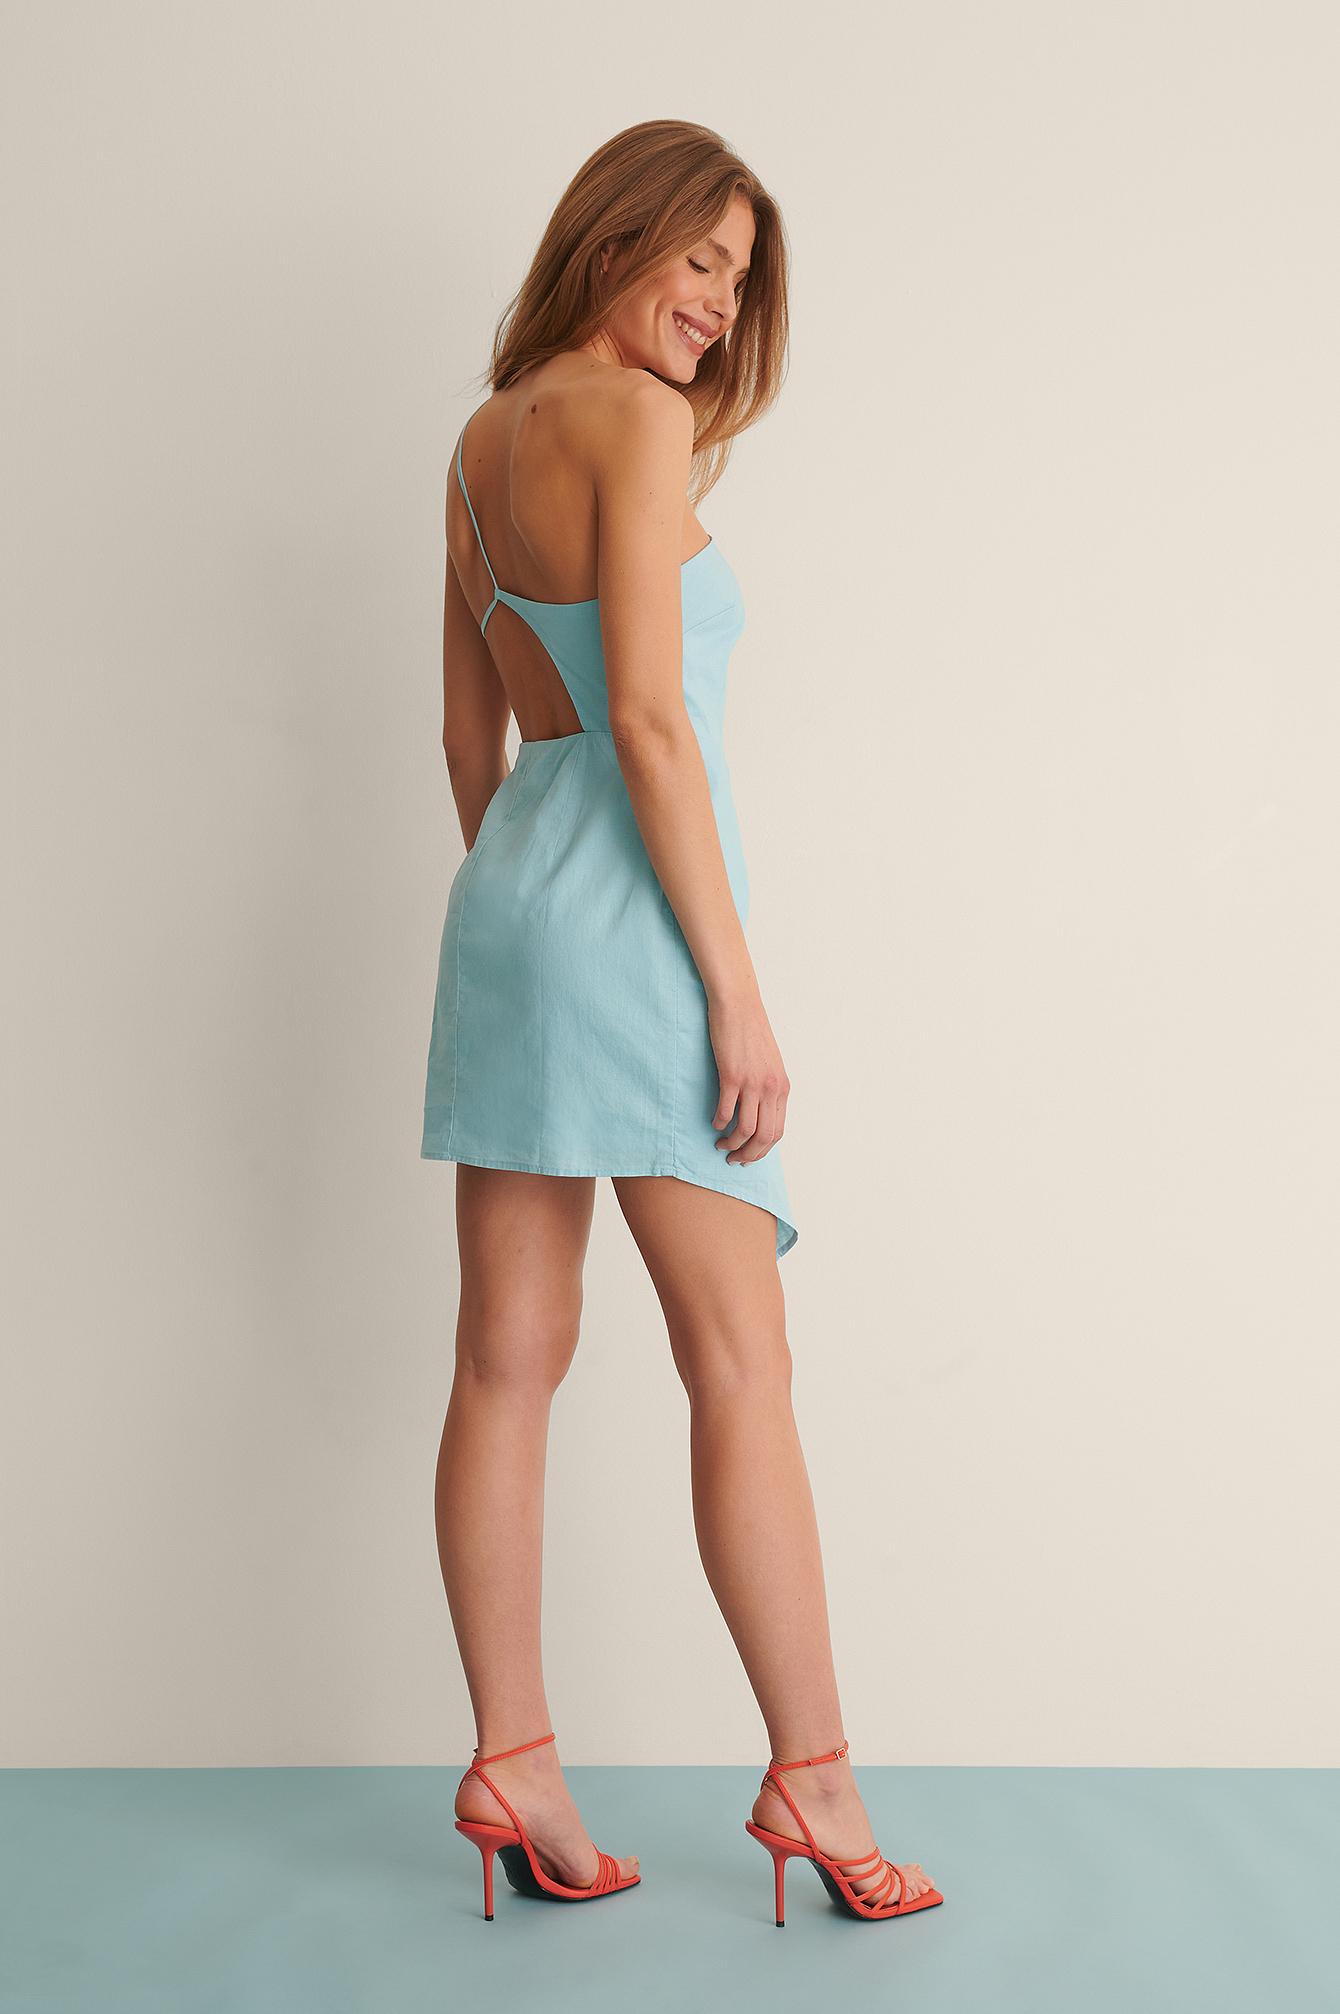 curated styles -  Minikleid Aus Leinenmischung - Blue